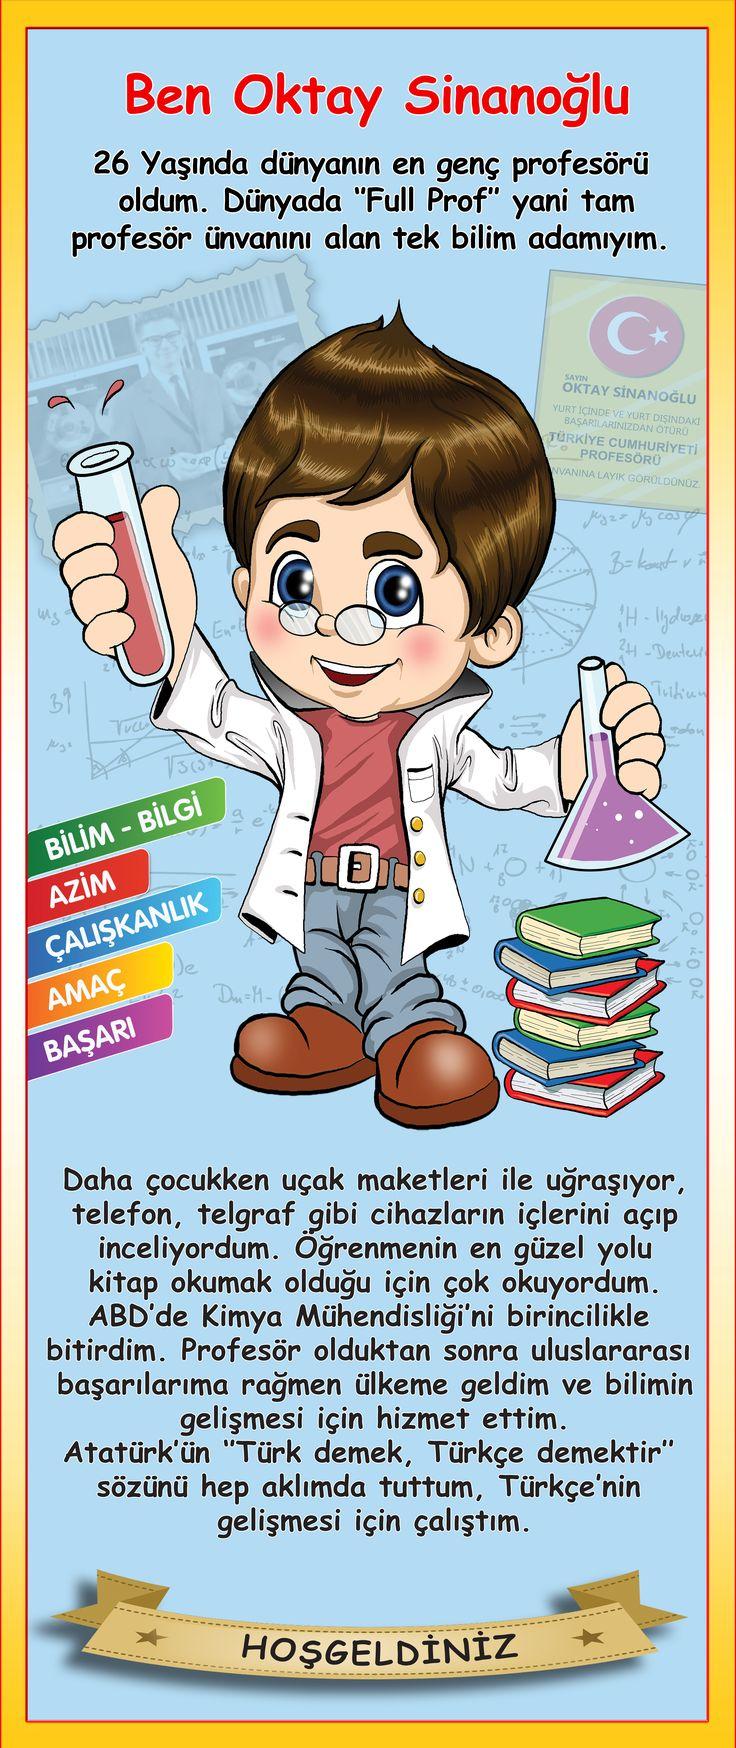 24 Eğitim http://turkrazzi.com/ppost/436004807664361373/ Eğitim http://turkrazzi.com/ppost/818036719786448151/